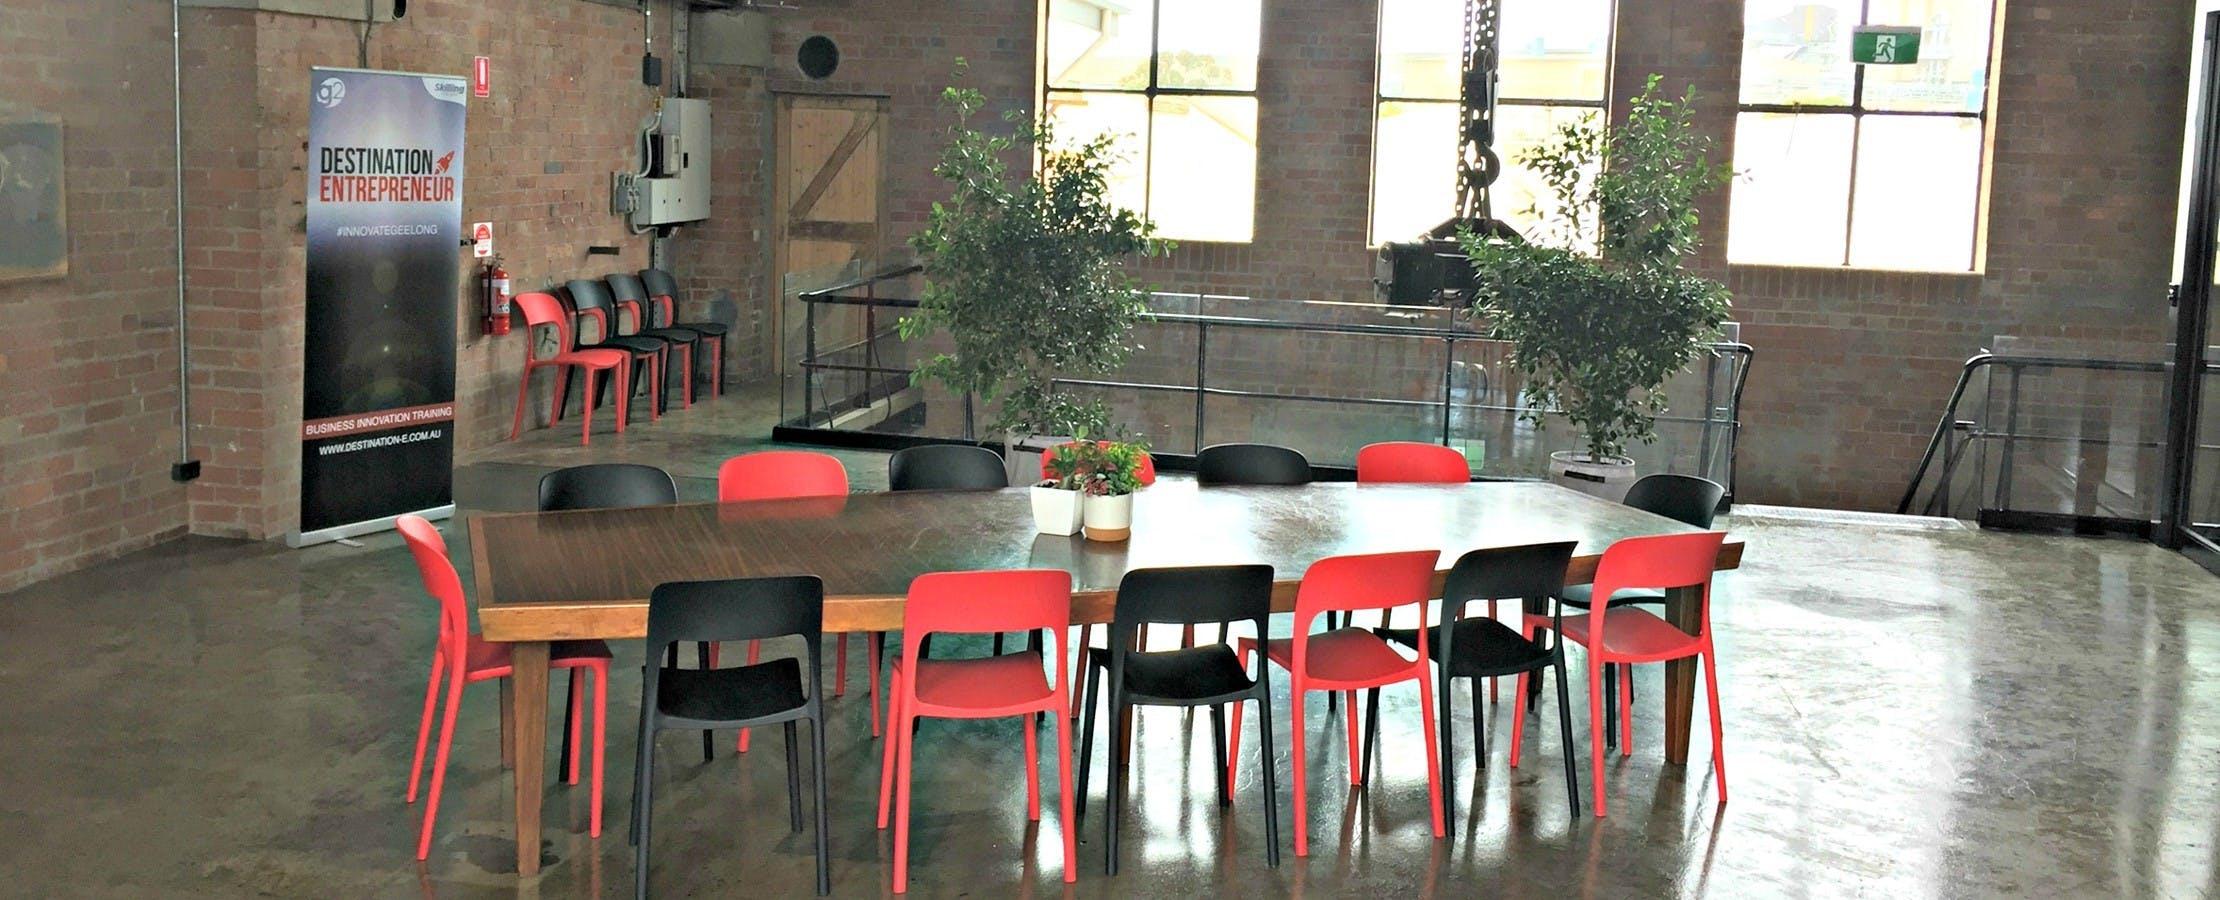 Training room at The Powerhouse, image 1